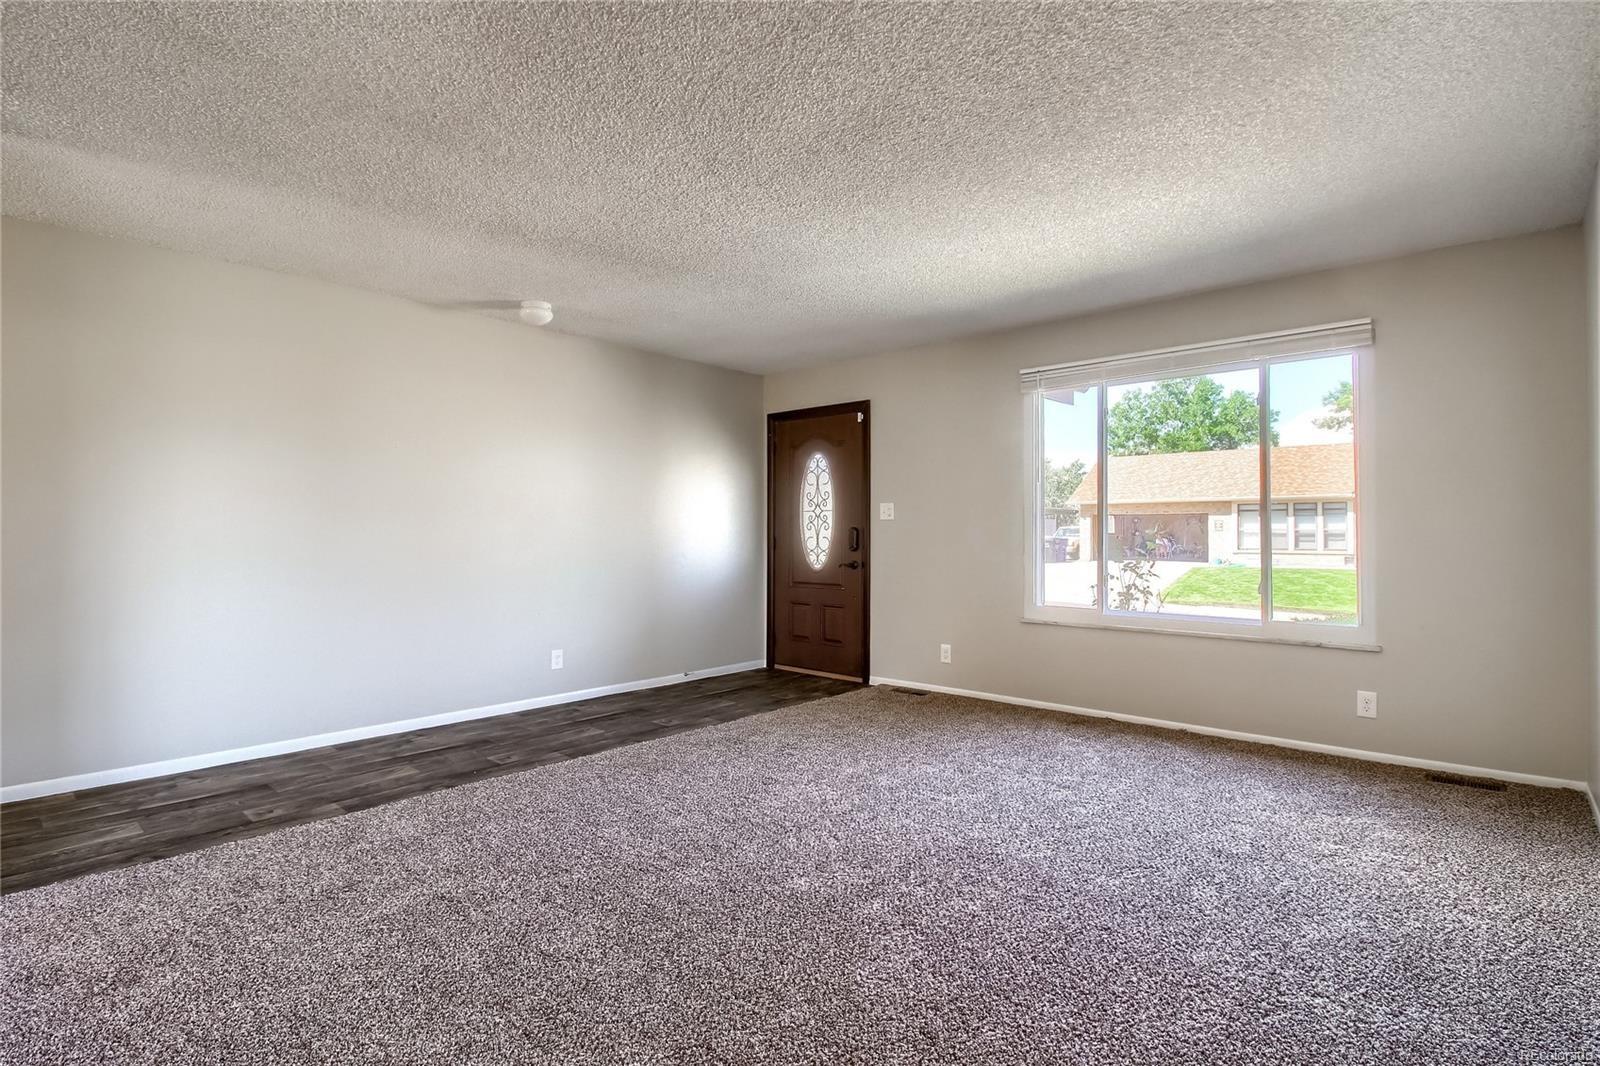 MLS# 4817896 - 7 - 5080 Worchester Street, Denver, CO 80239